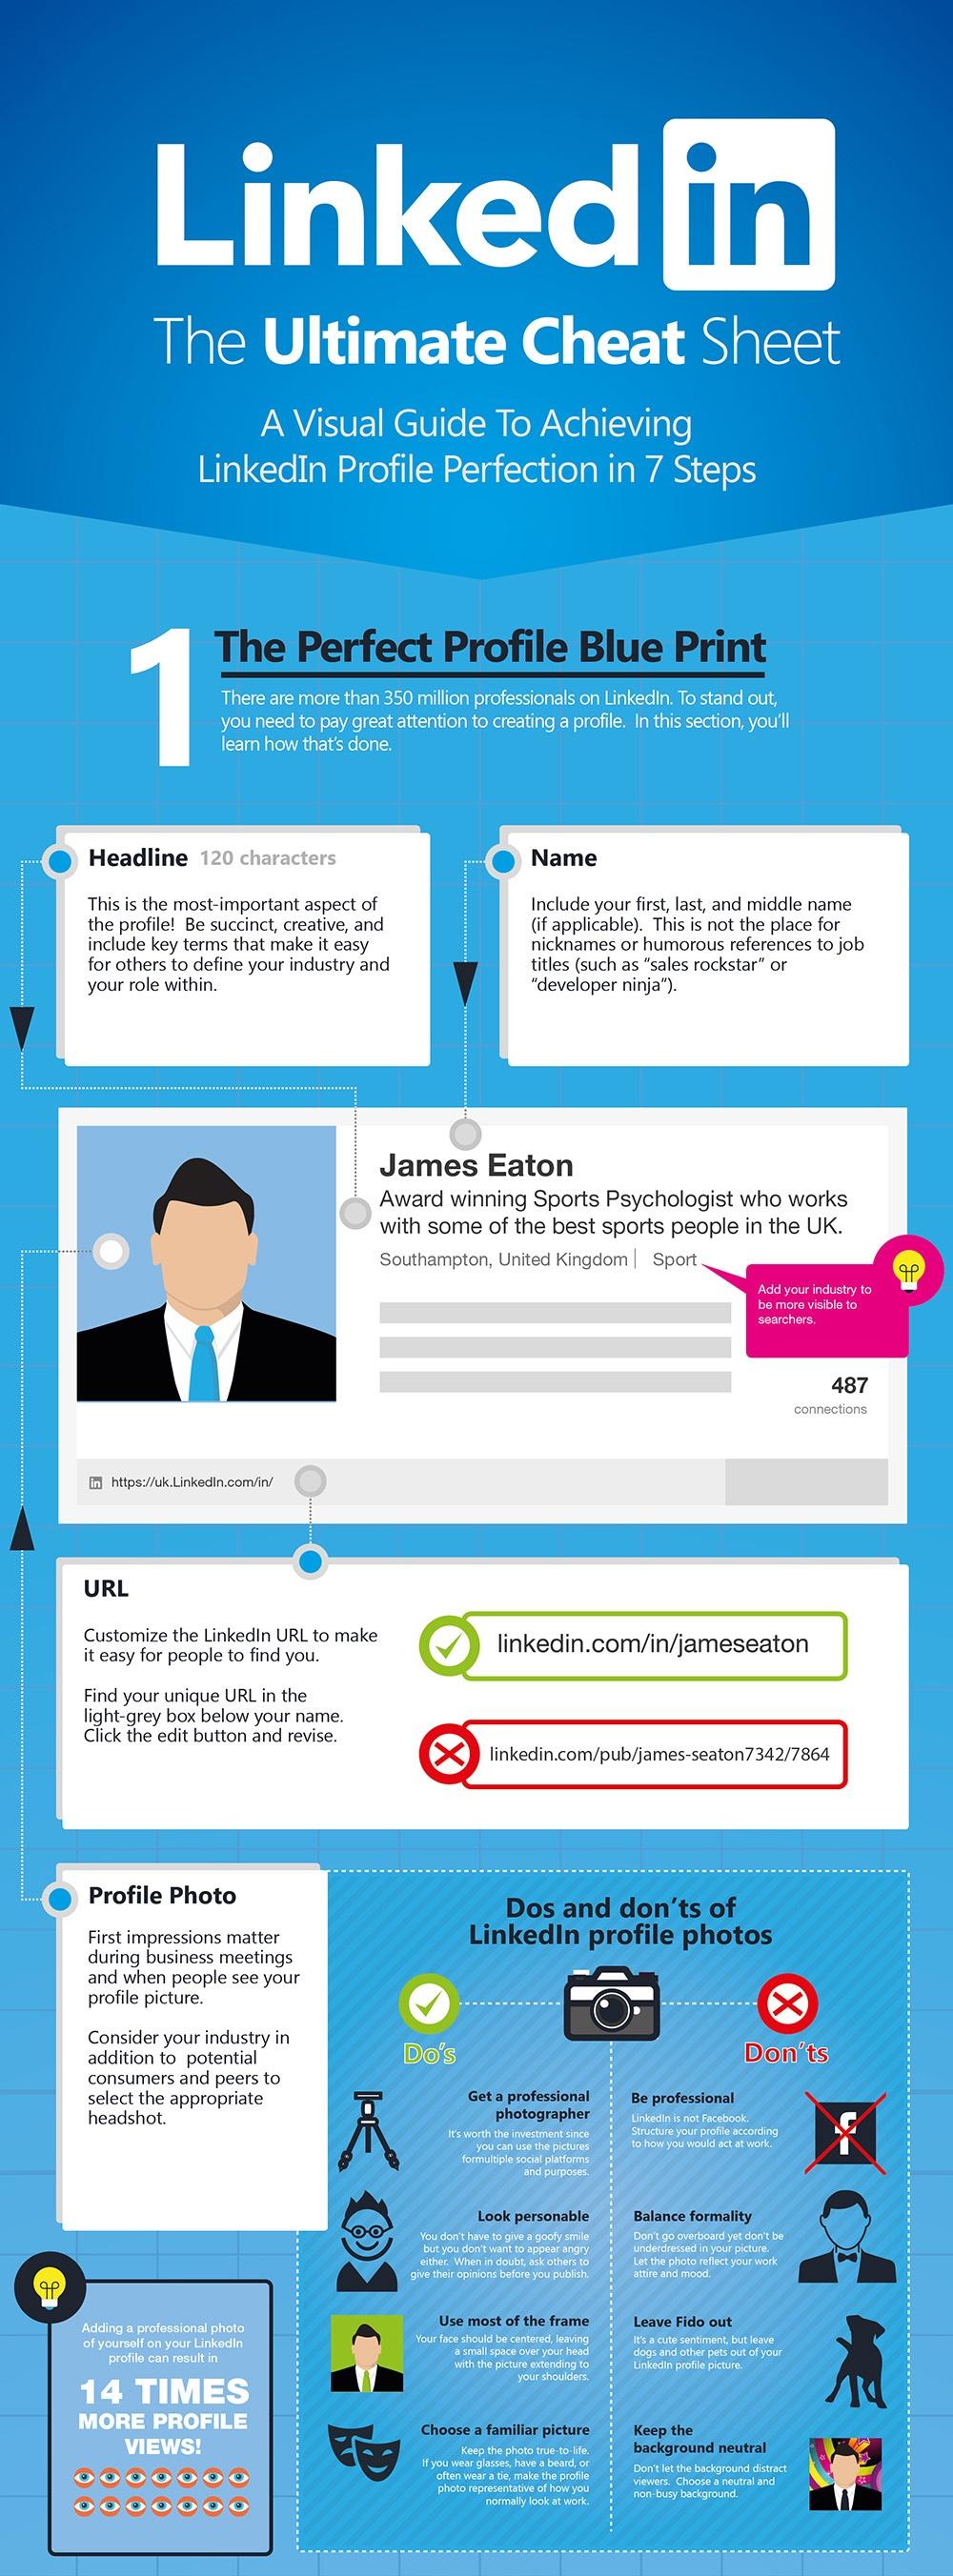 LinkedIn Profile Cheat Sheet Infographic.jpeg